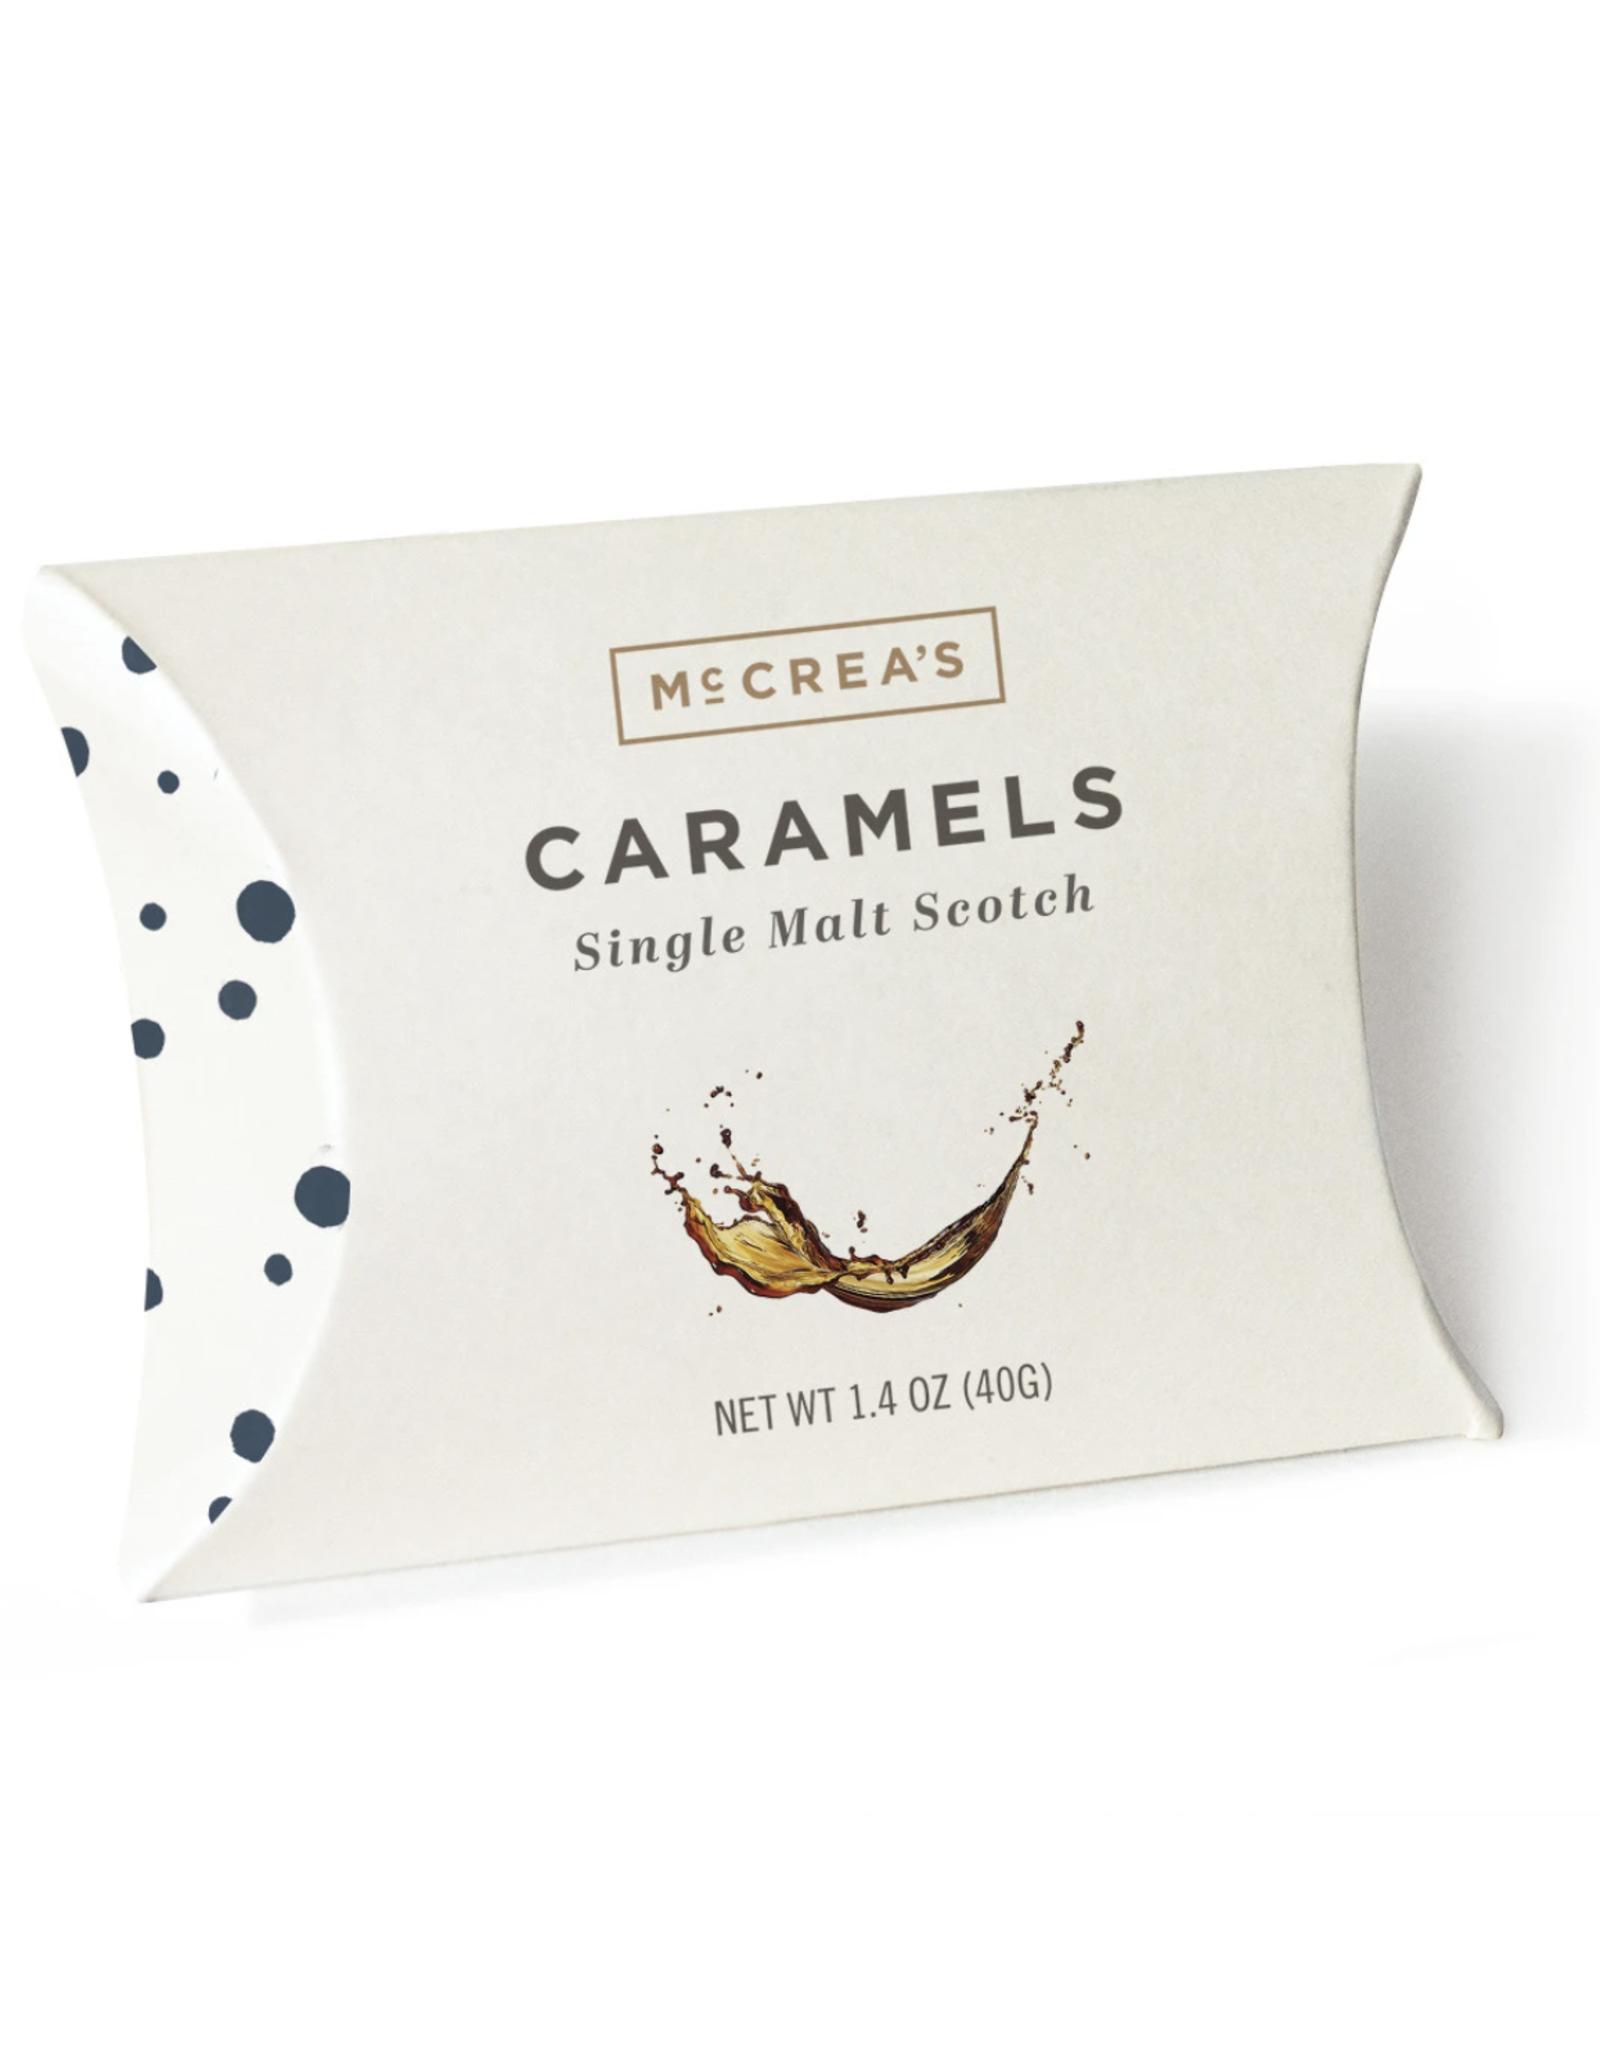 McCrea's Candies 1.4oz Pillows Single Malt Scotch